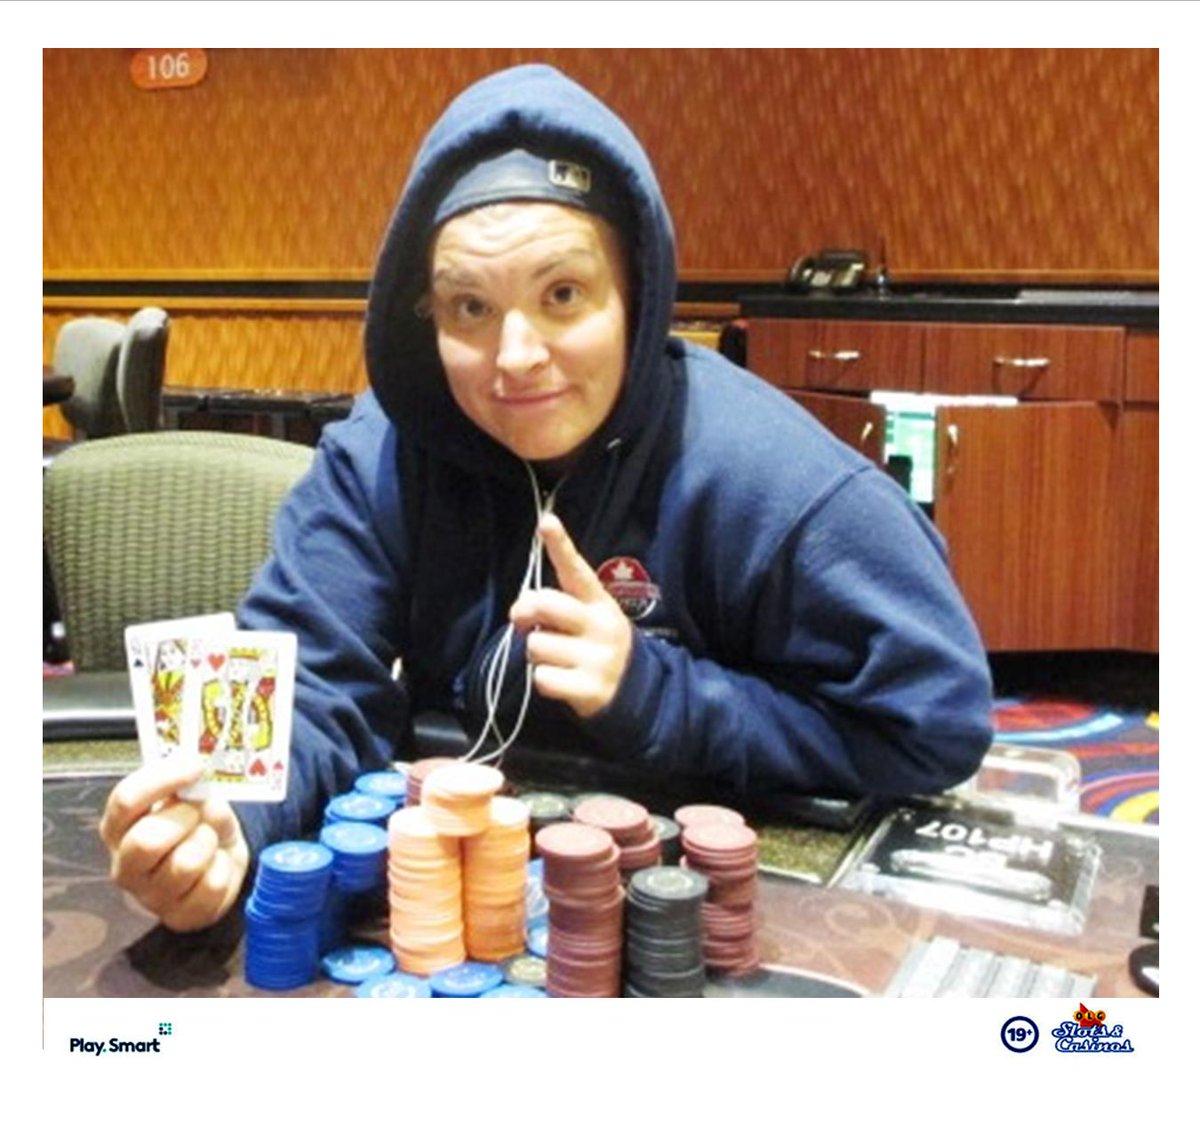 Brantford charity casino poker tournament casino car set